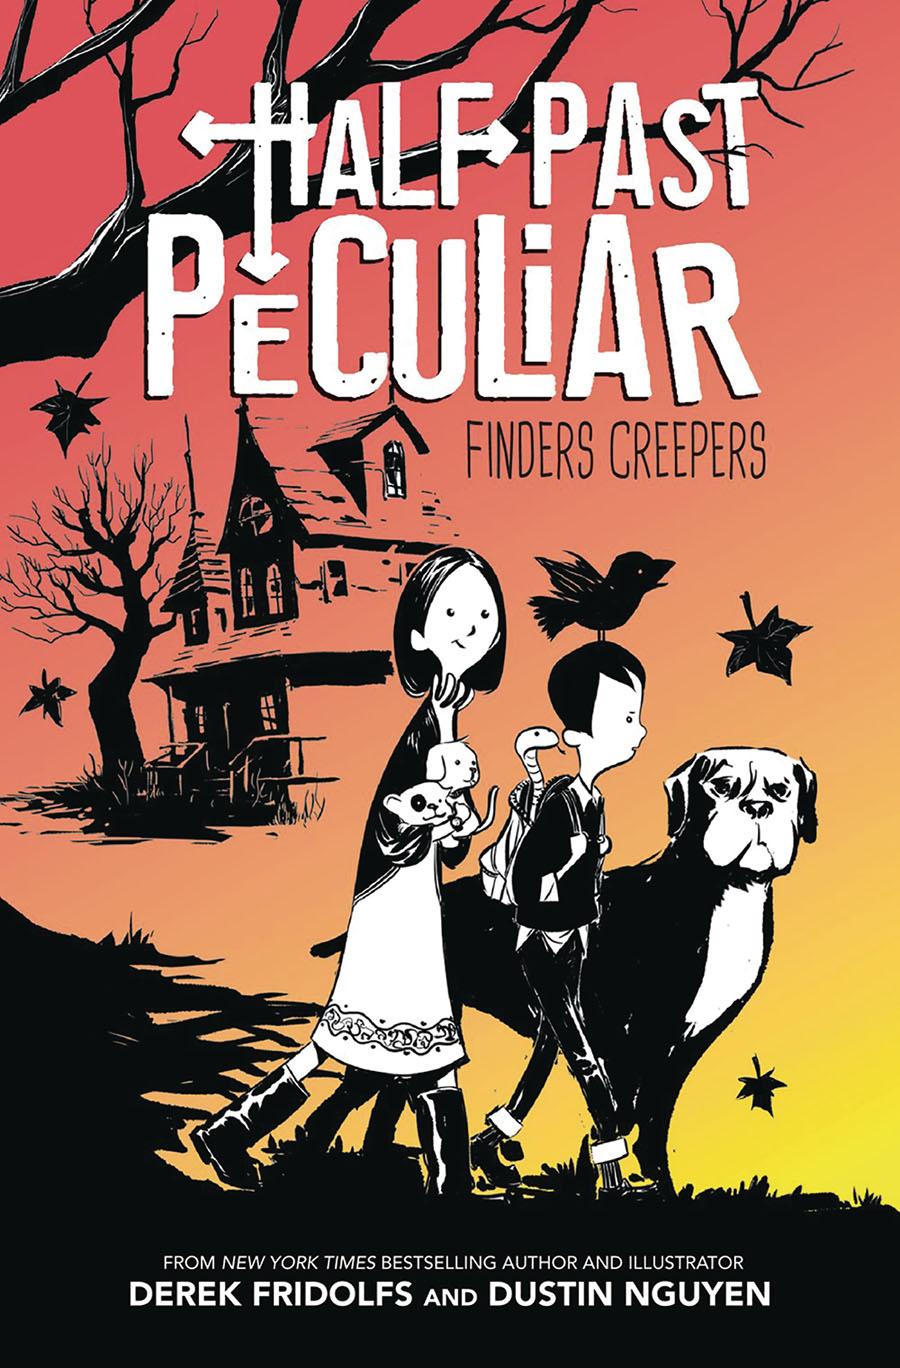 Half Past Peculiar Hybrid Novel Vol 1 Finders Creepers HC